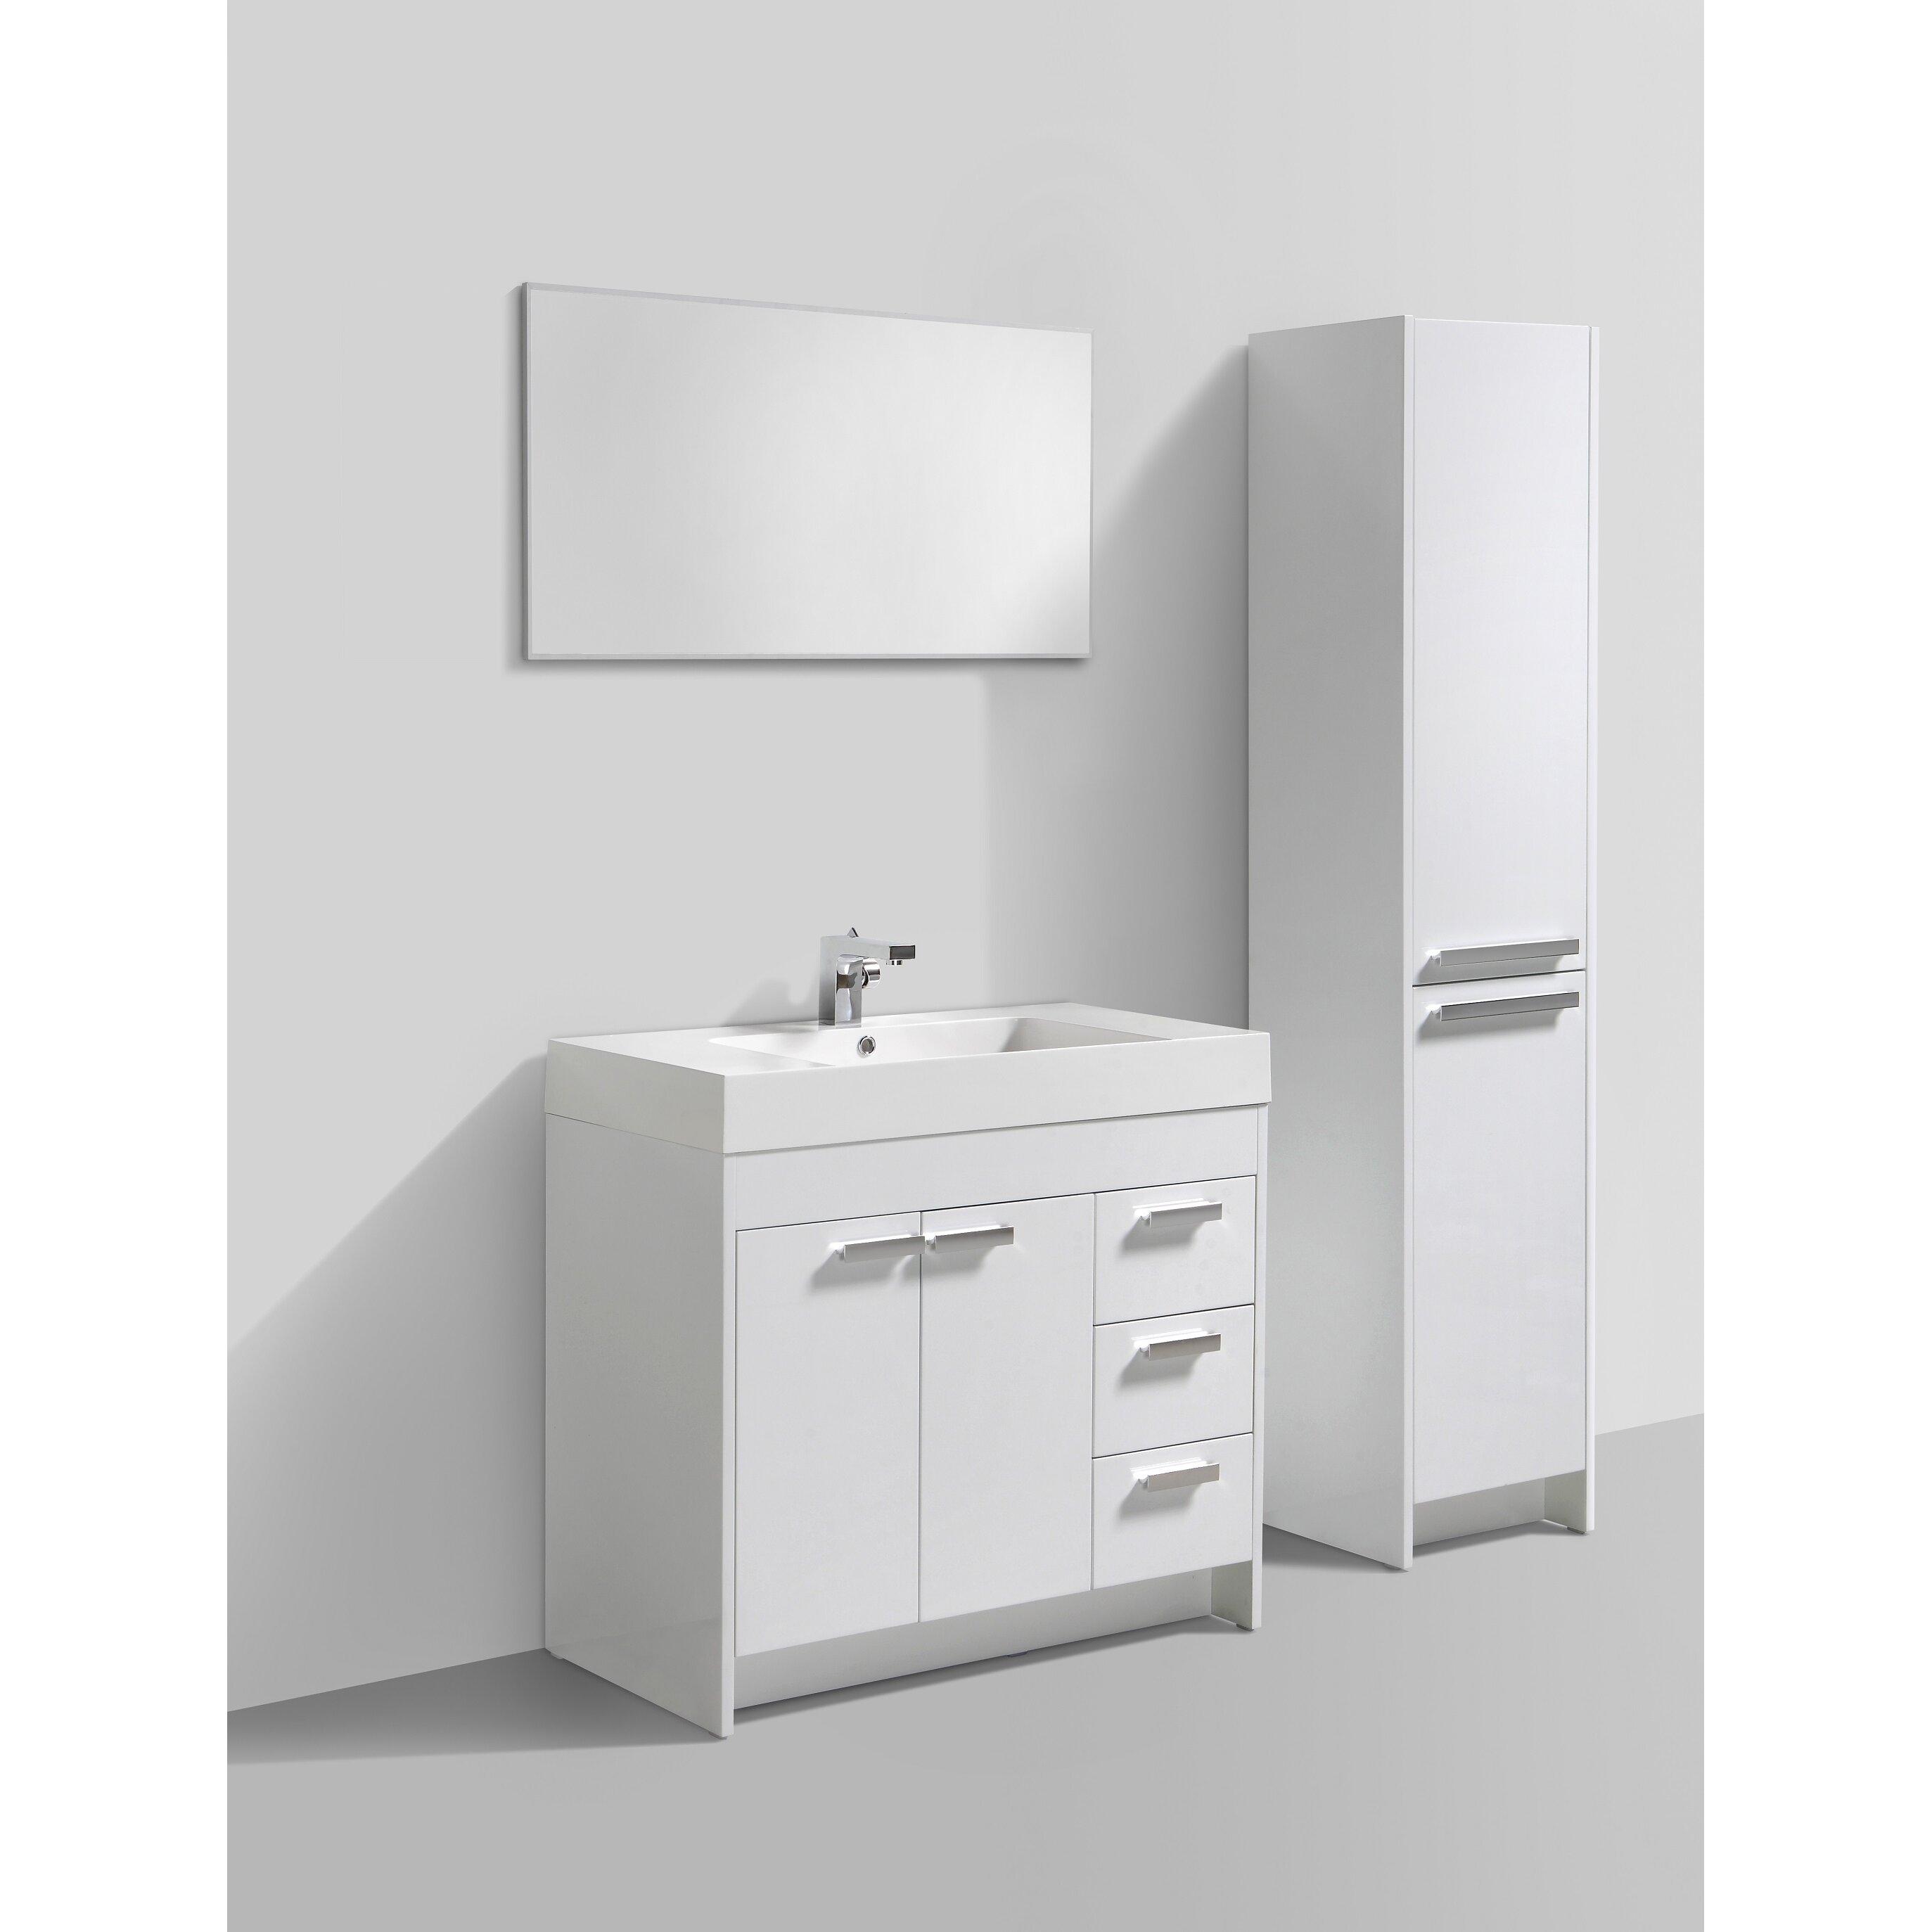 Bathroom Vanity Set Eviva Lugano 36 Single Bathroom Vanity Set Reviews Wayfair